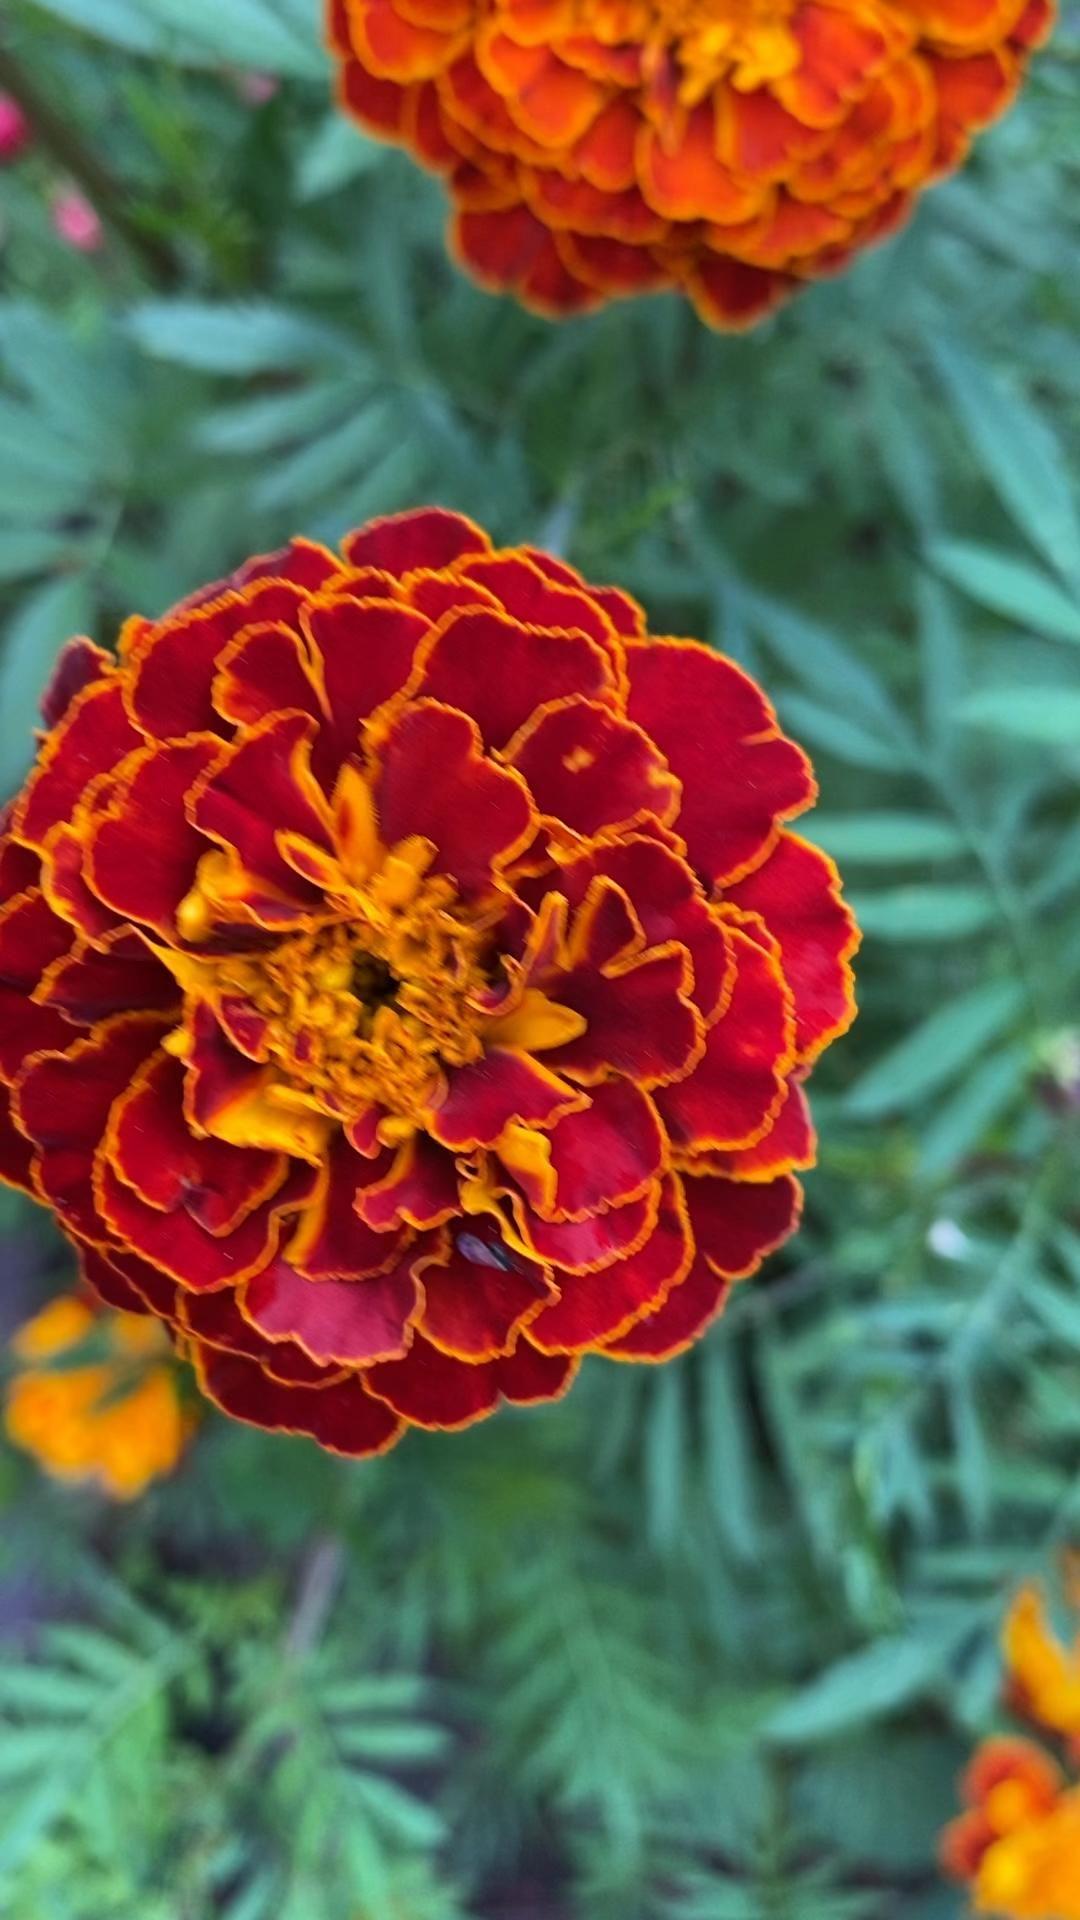 Magnificent Marigolds